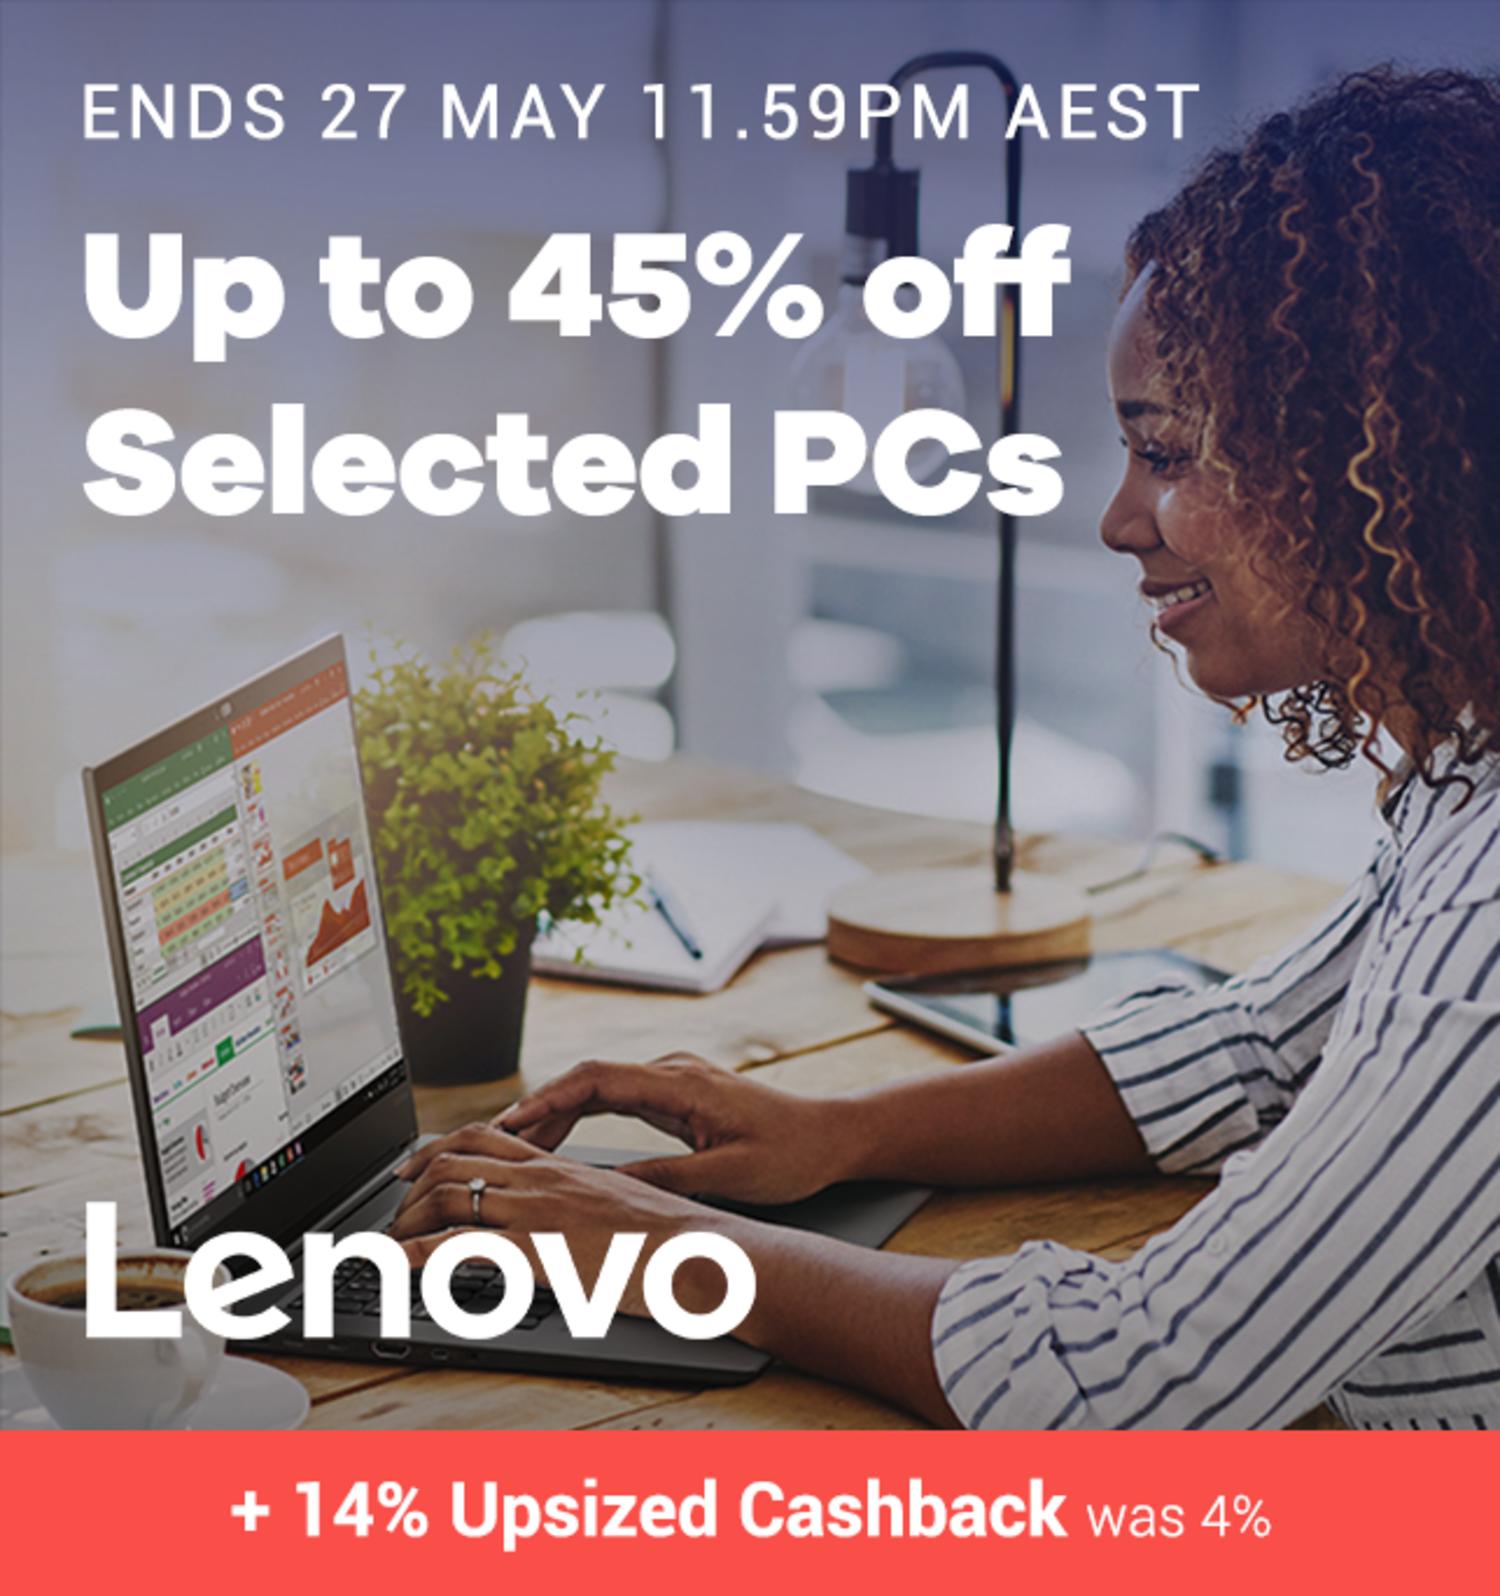 Lenovo - 14% Upsized Cashback